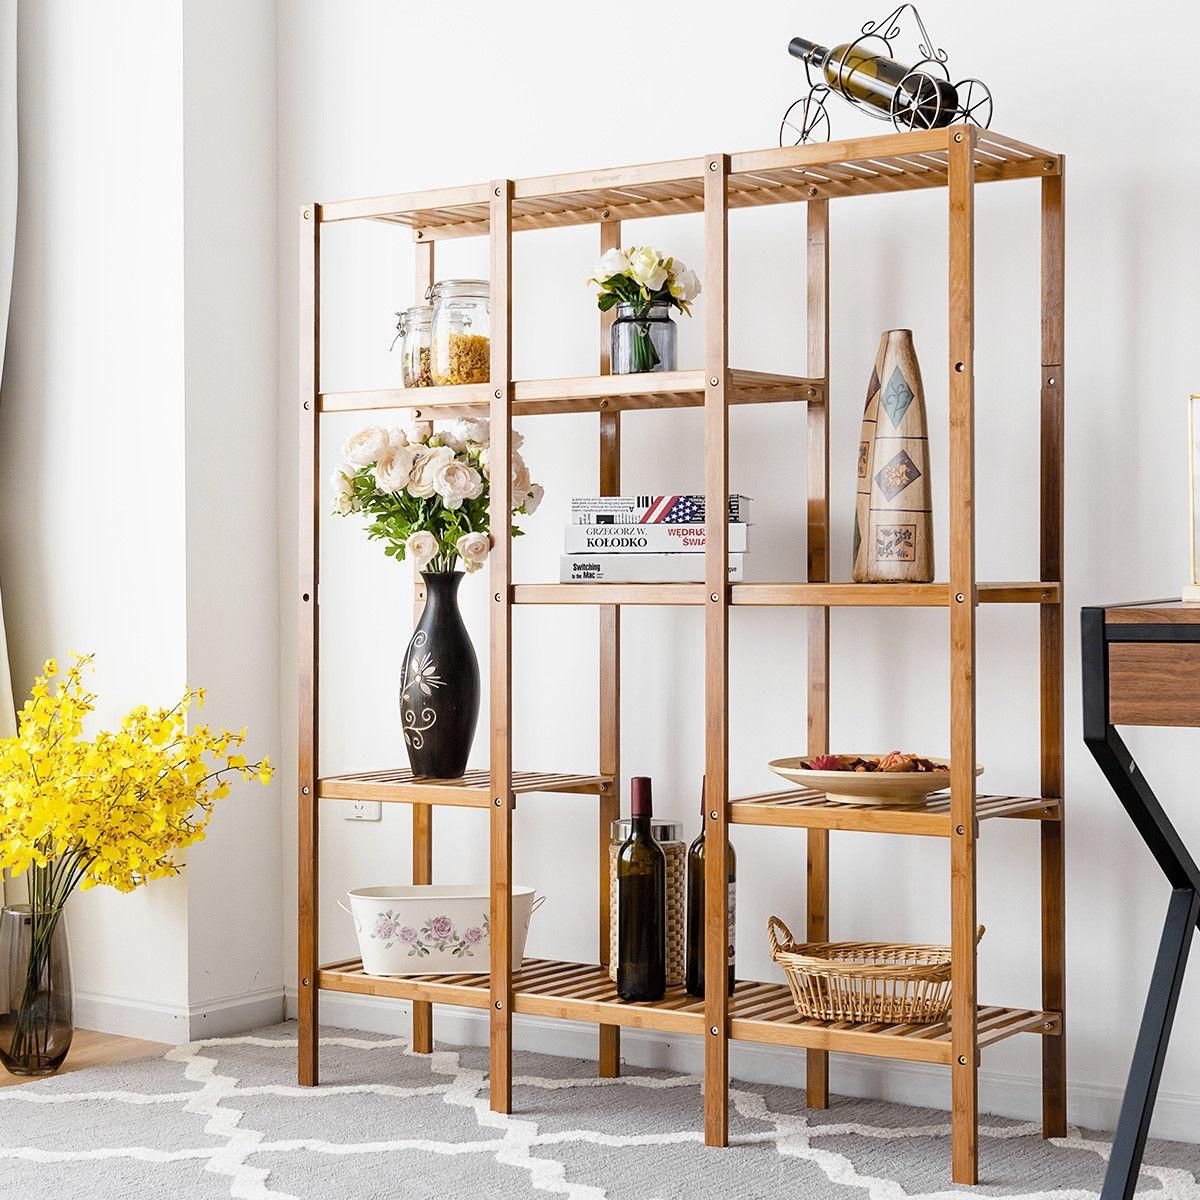 Multifunctional Bamboo Shelf Storage Organizer Rack